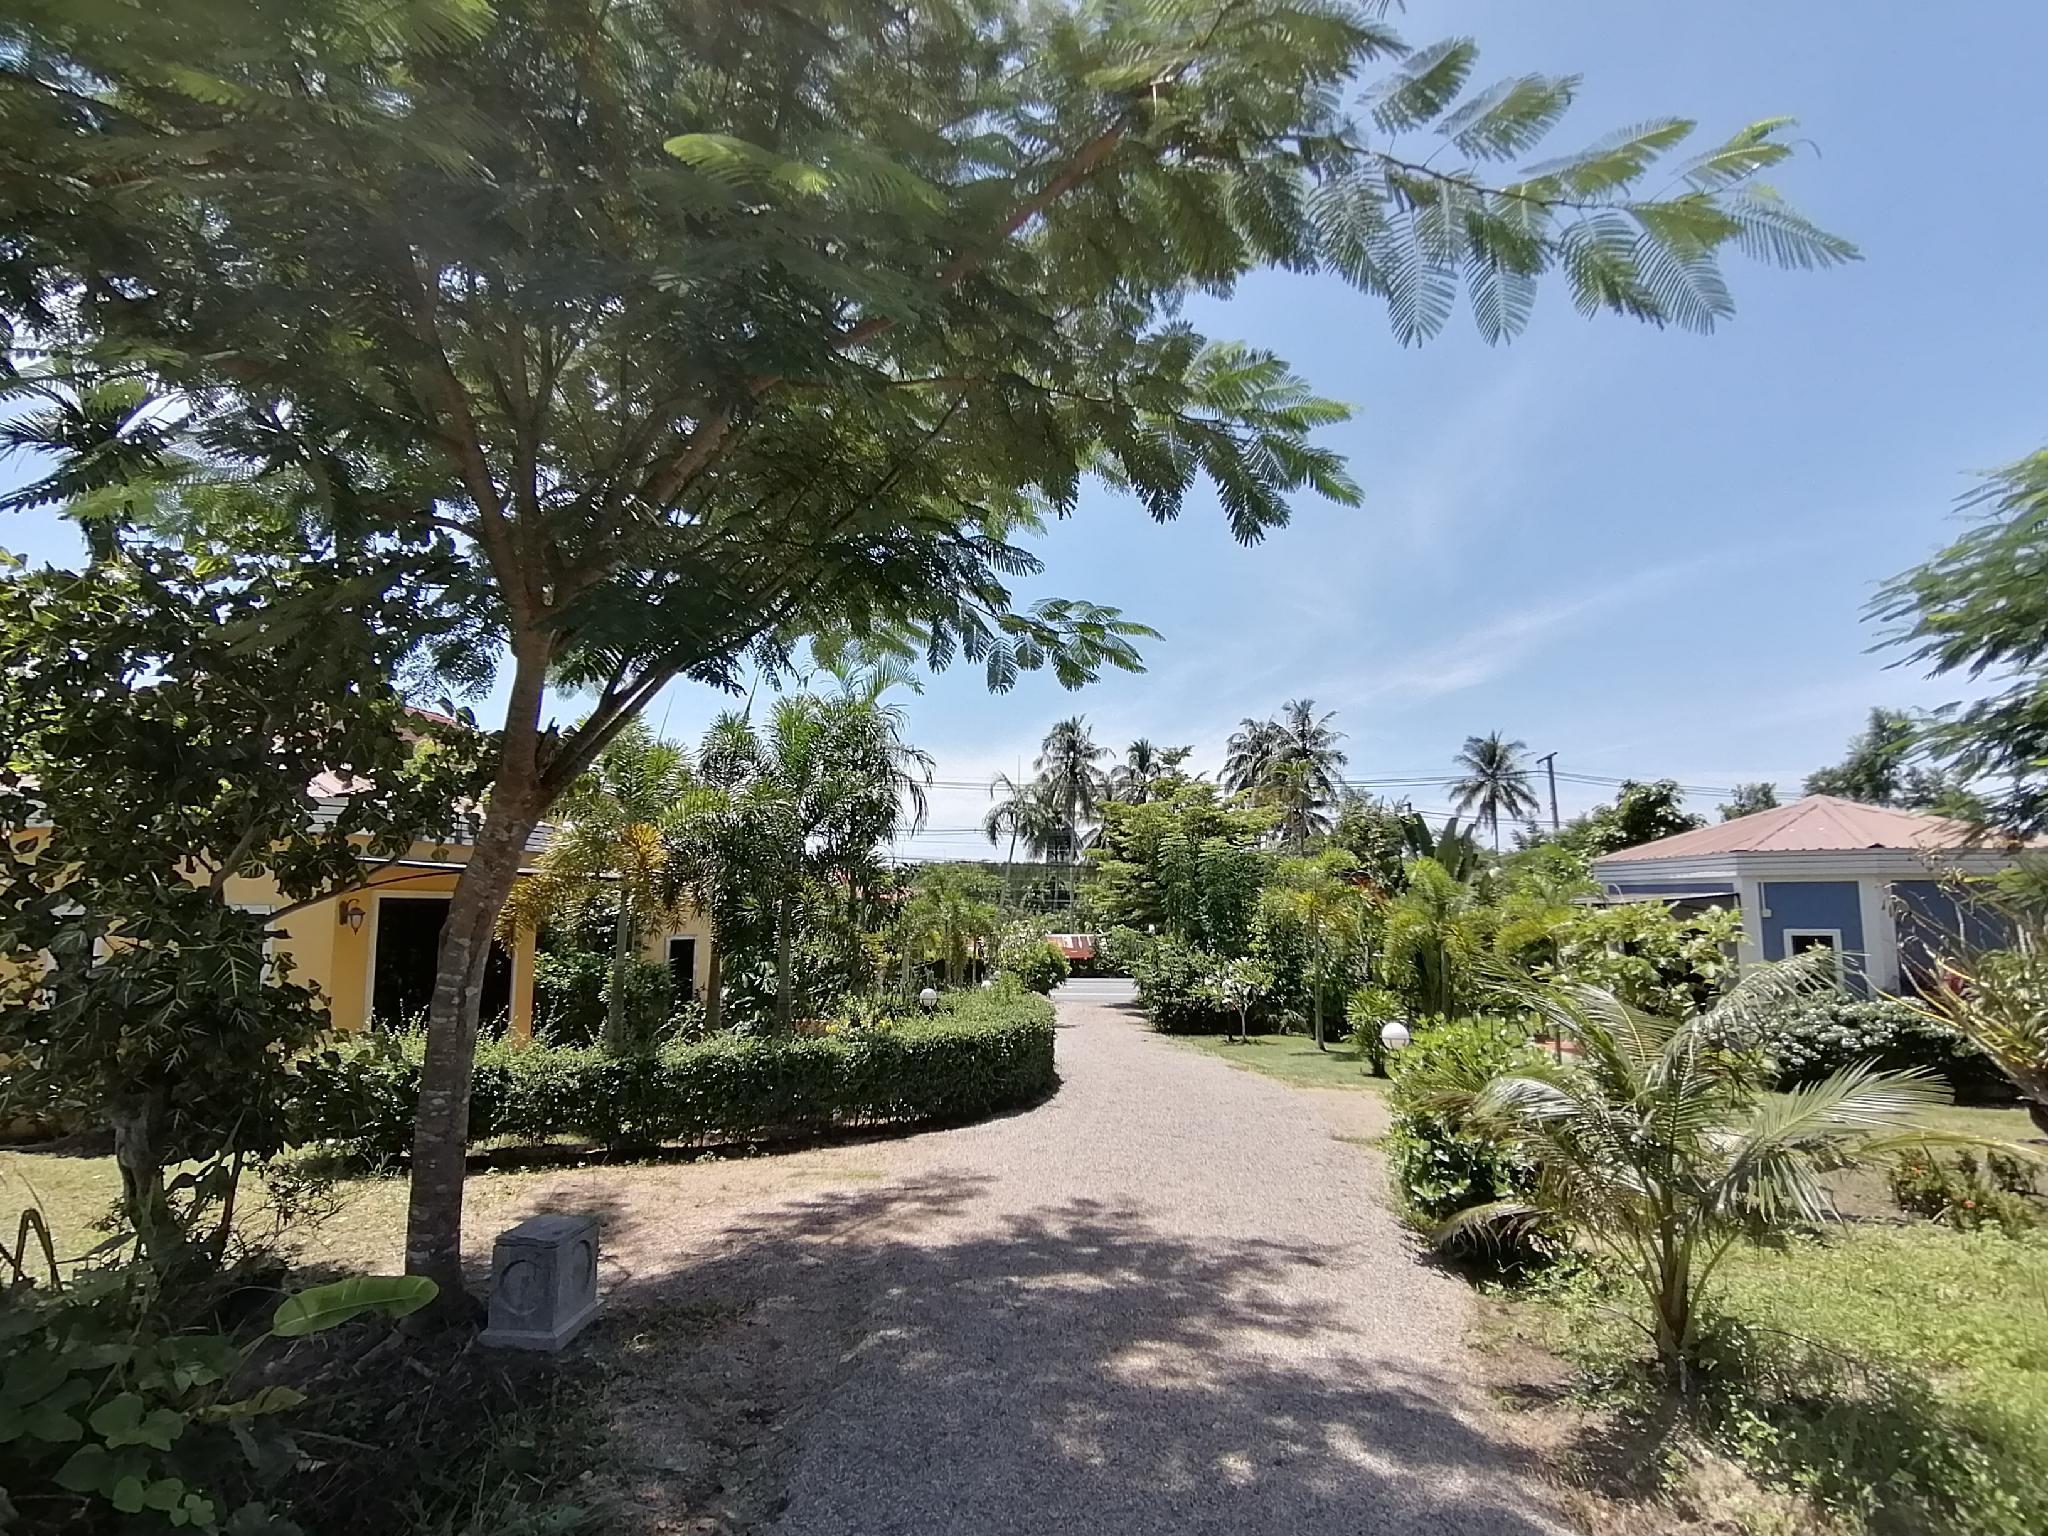 Sukonta Garden 2 บ้านเดี่ยว 1 ห้องนอน 1 ห้องน้ำส่วนตัว ขนาด 25 ตร.ม. – หาดคลองม่วง